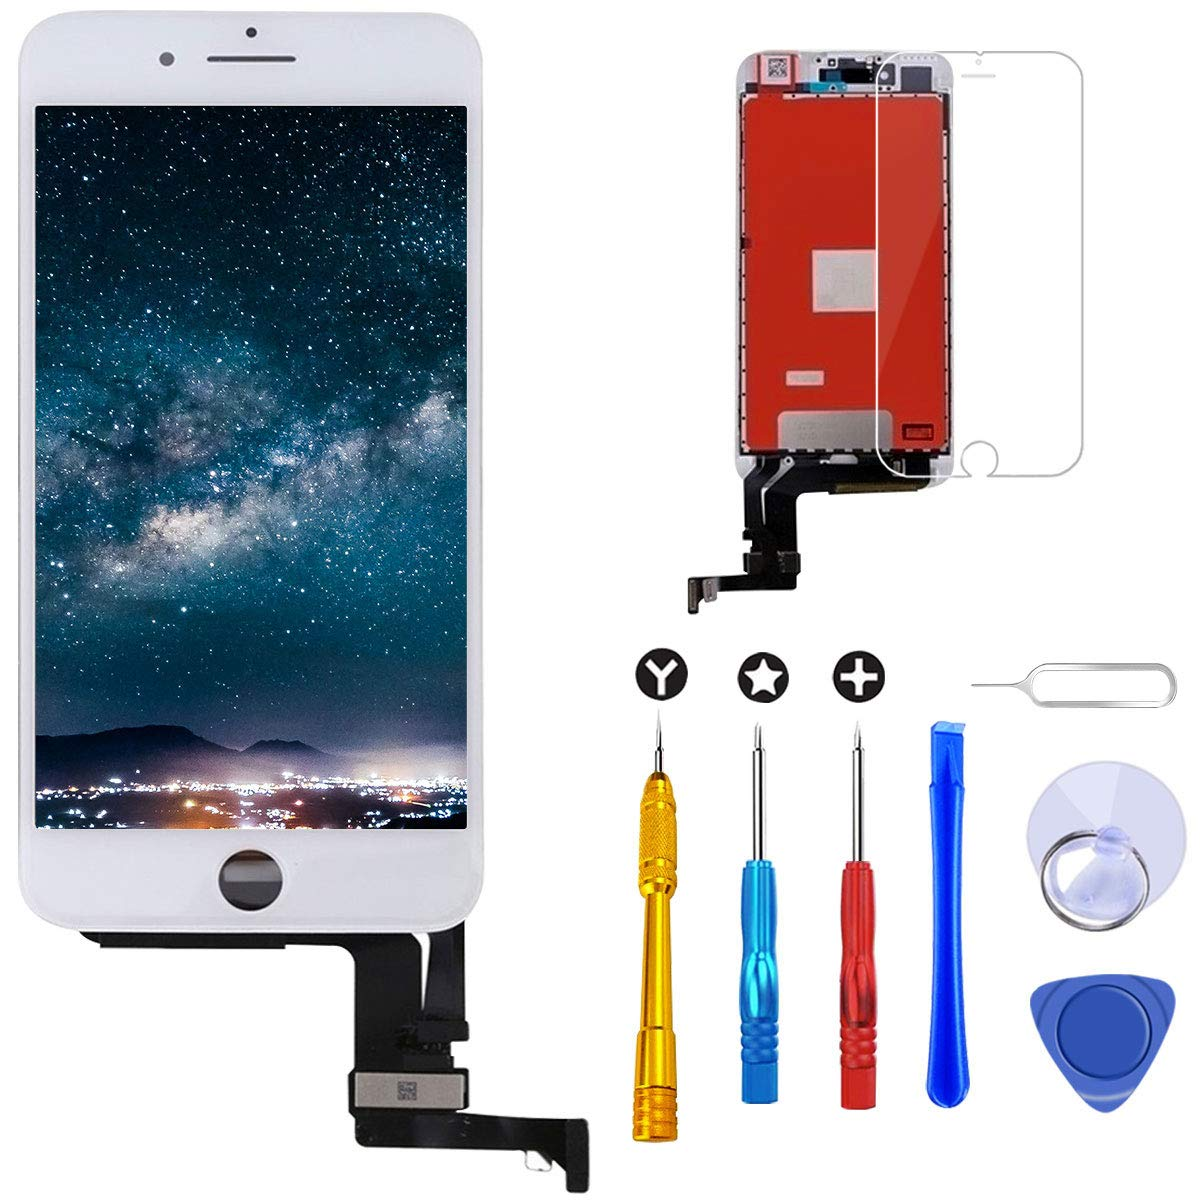 Modulo LCD Blanco para IPhone 7 Plus 5.5 Inch  -336